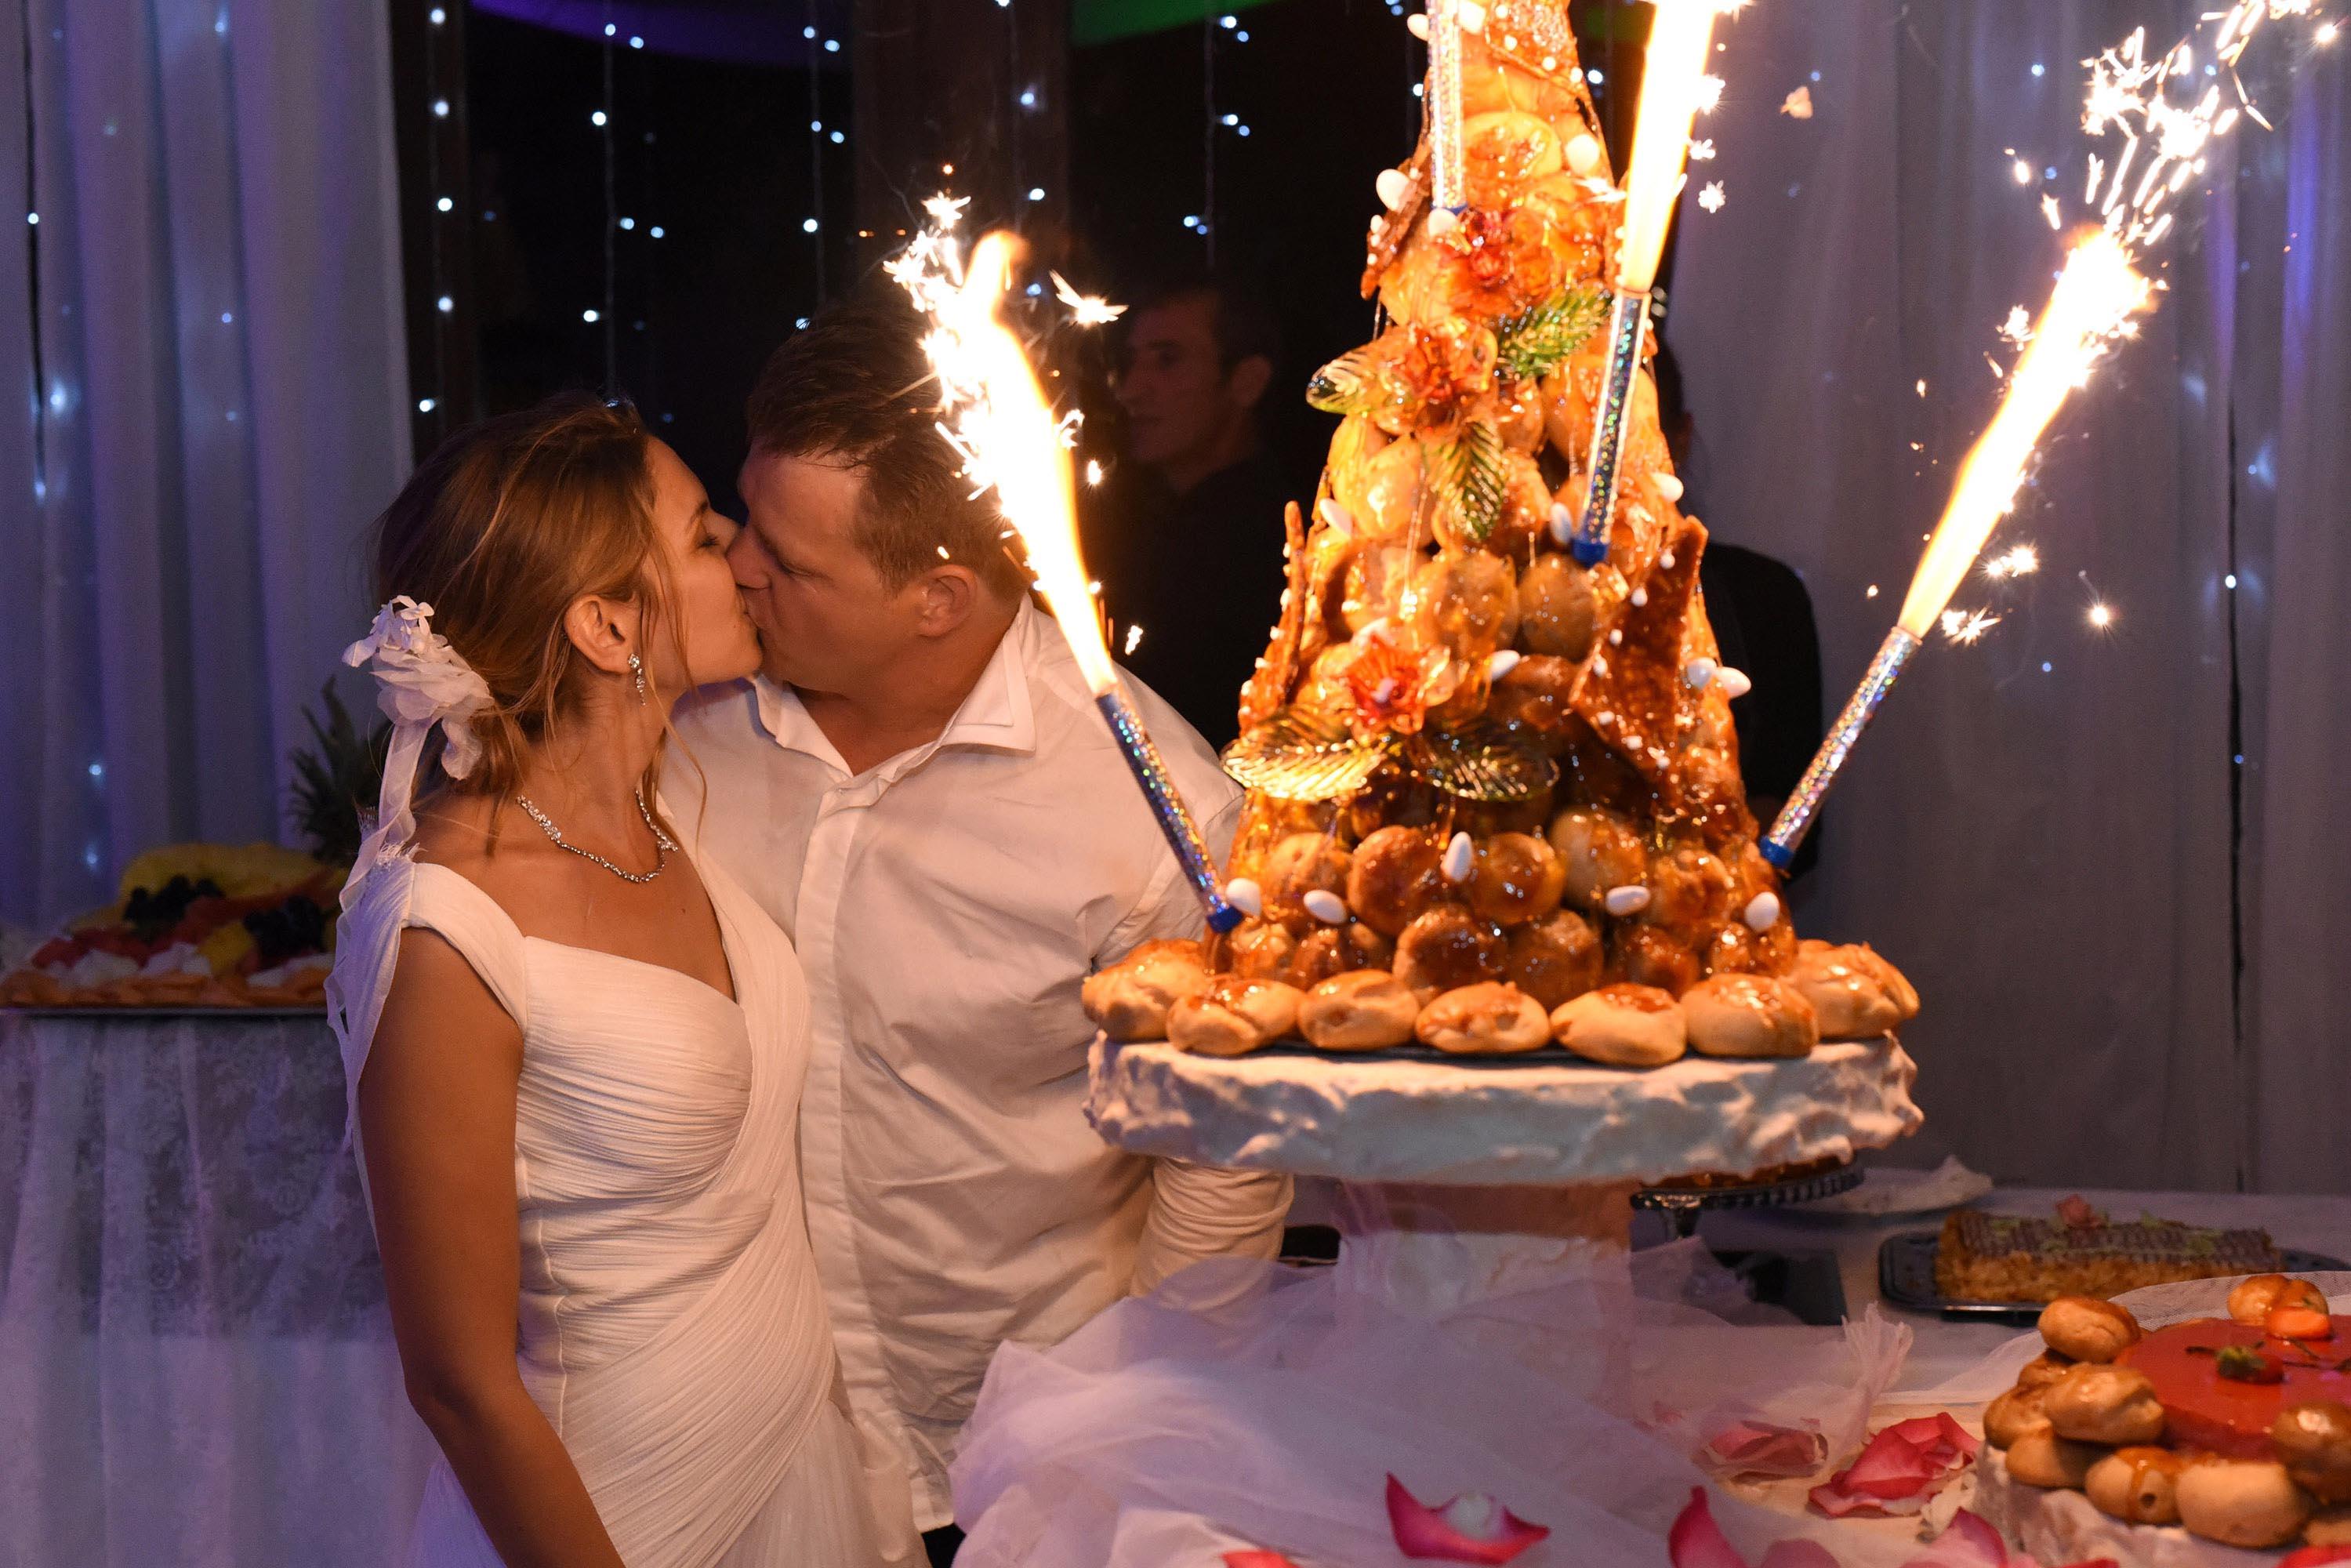 photographe-mariage-soiree-pertuis-vaucluse